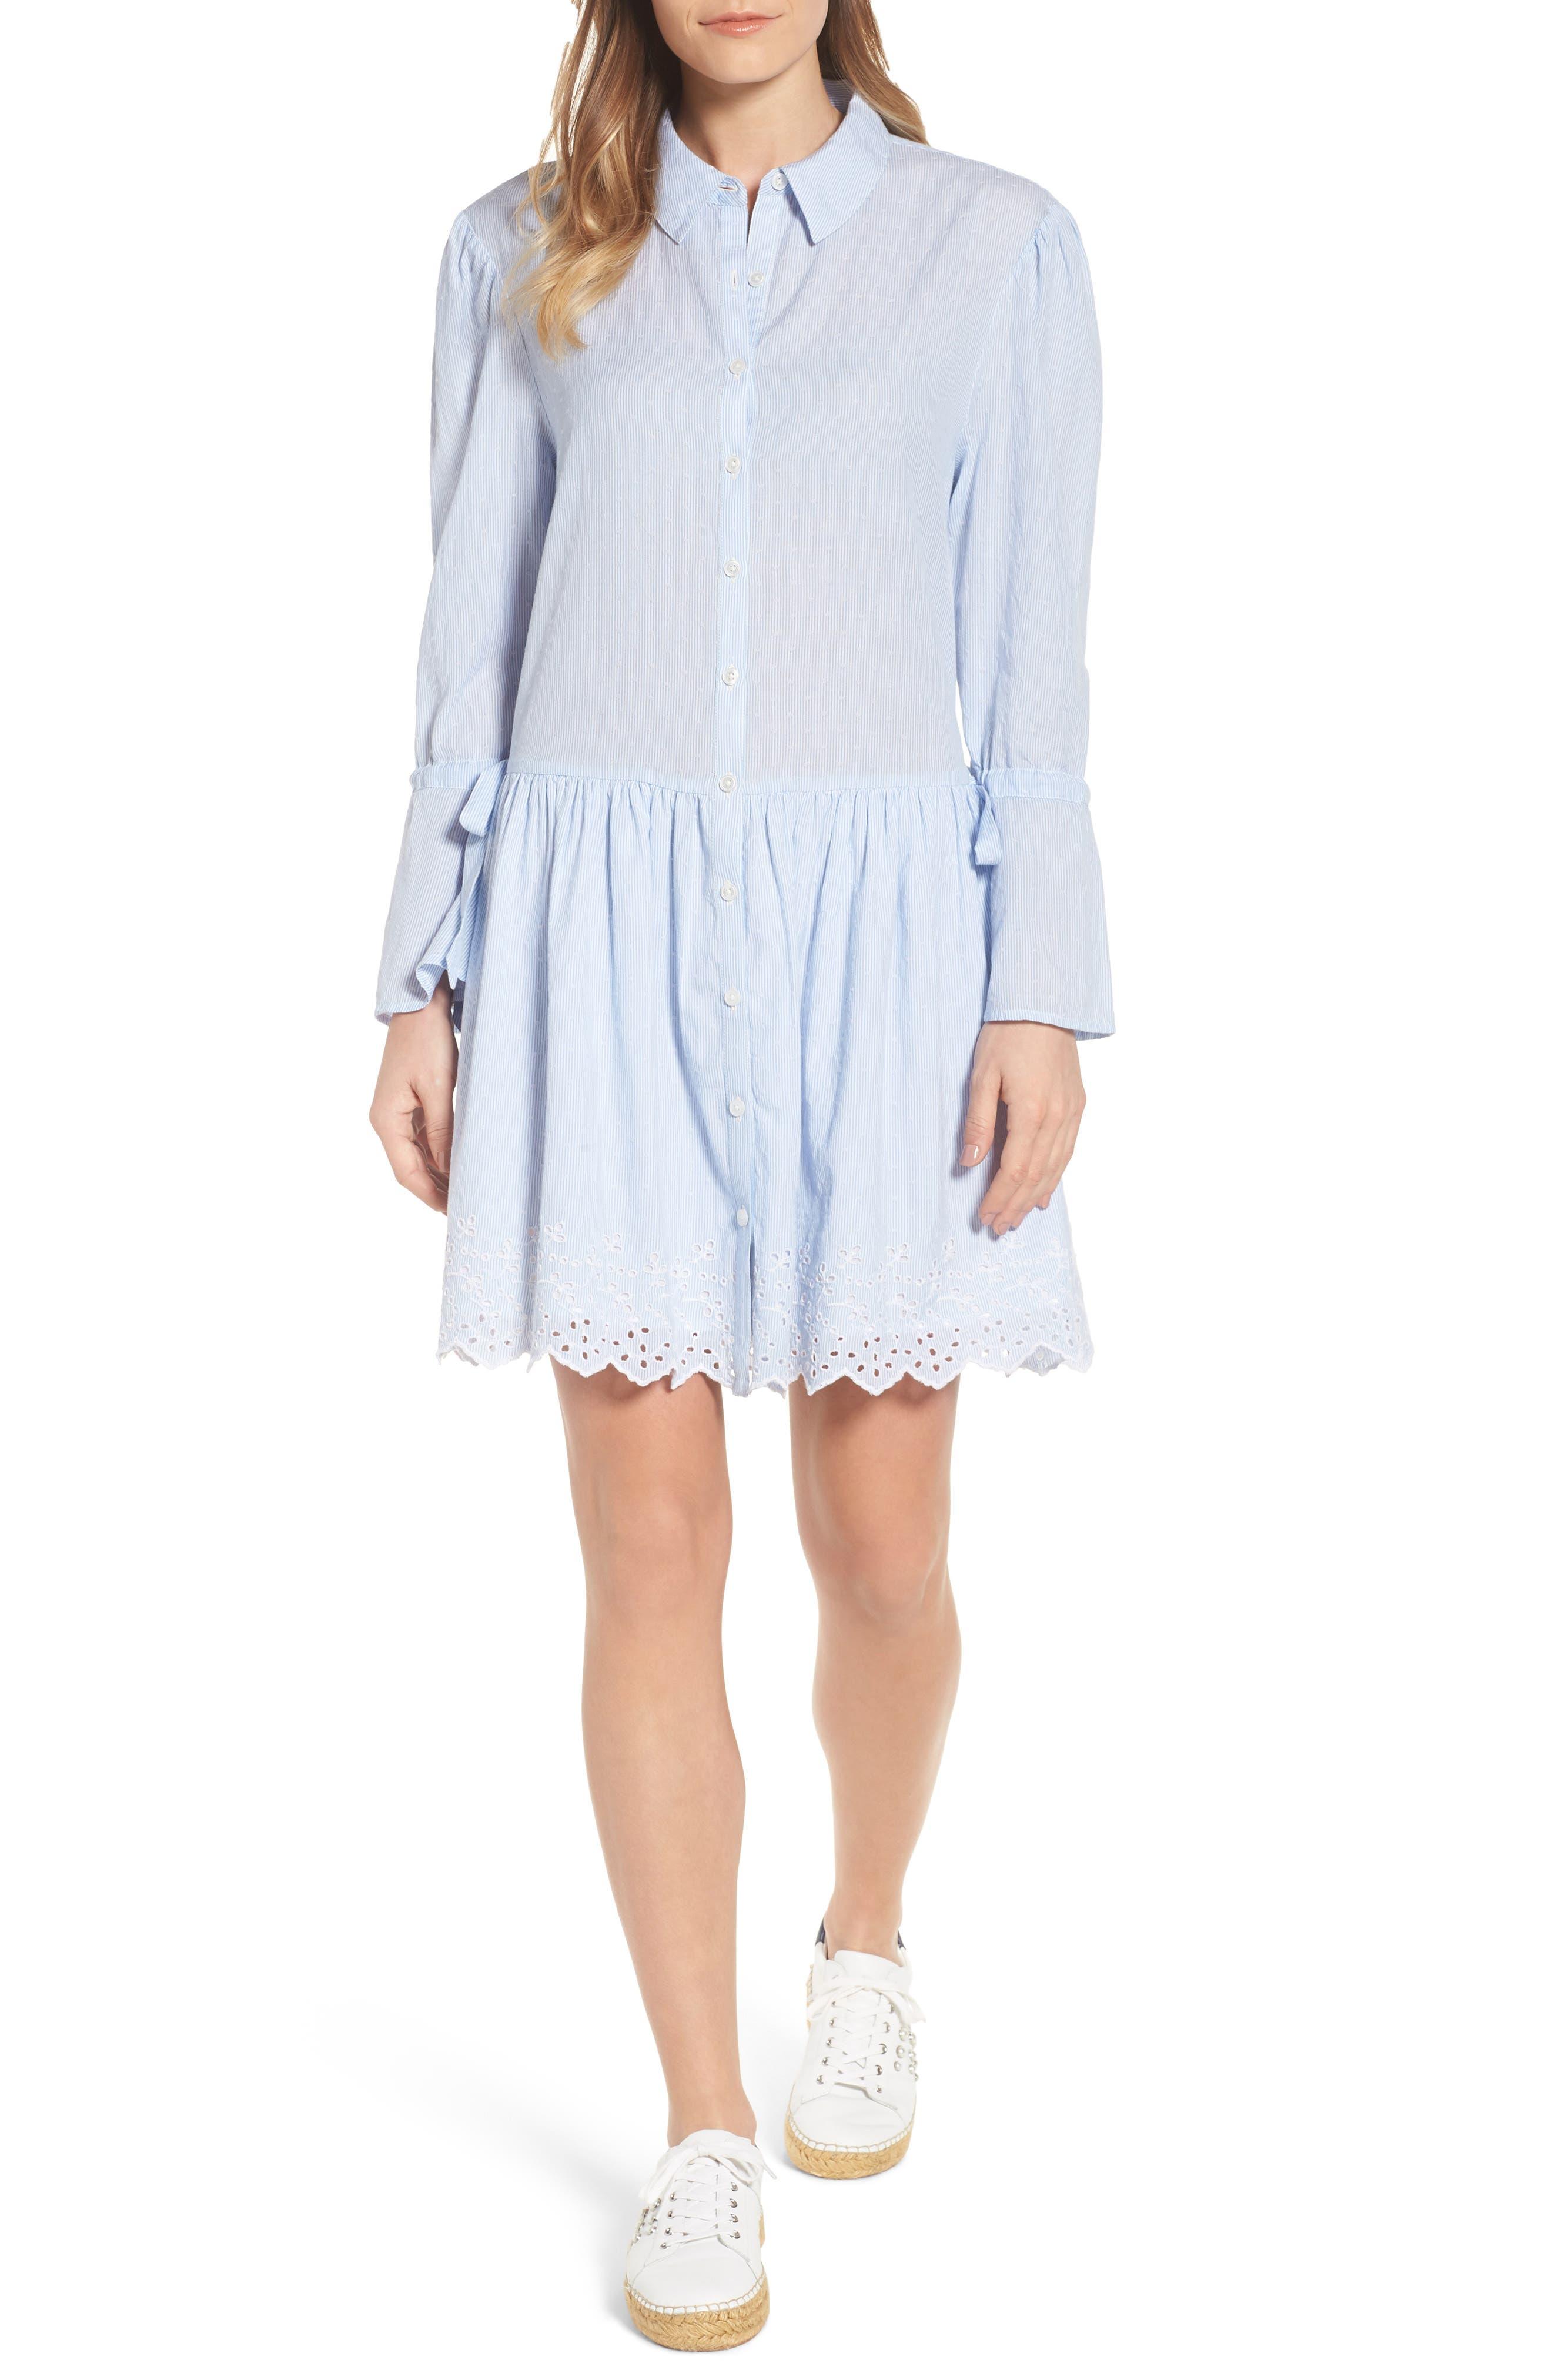 Pinstripe Eyelet Trim Cotton Shirtdress,                             Main thumbnail 1, color,                             Blue- White Stripe